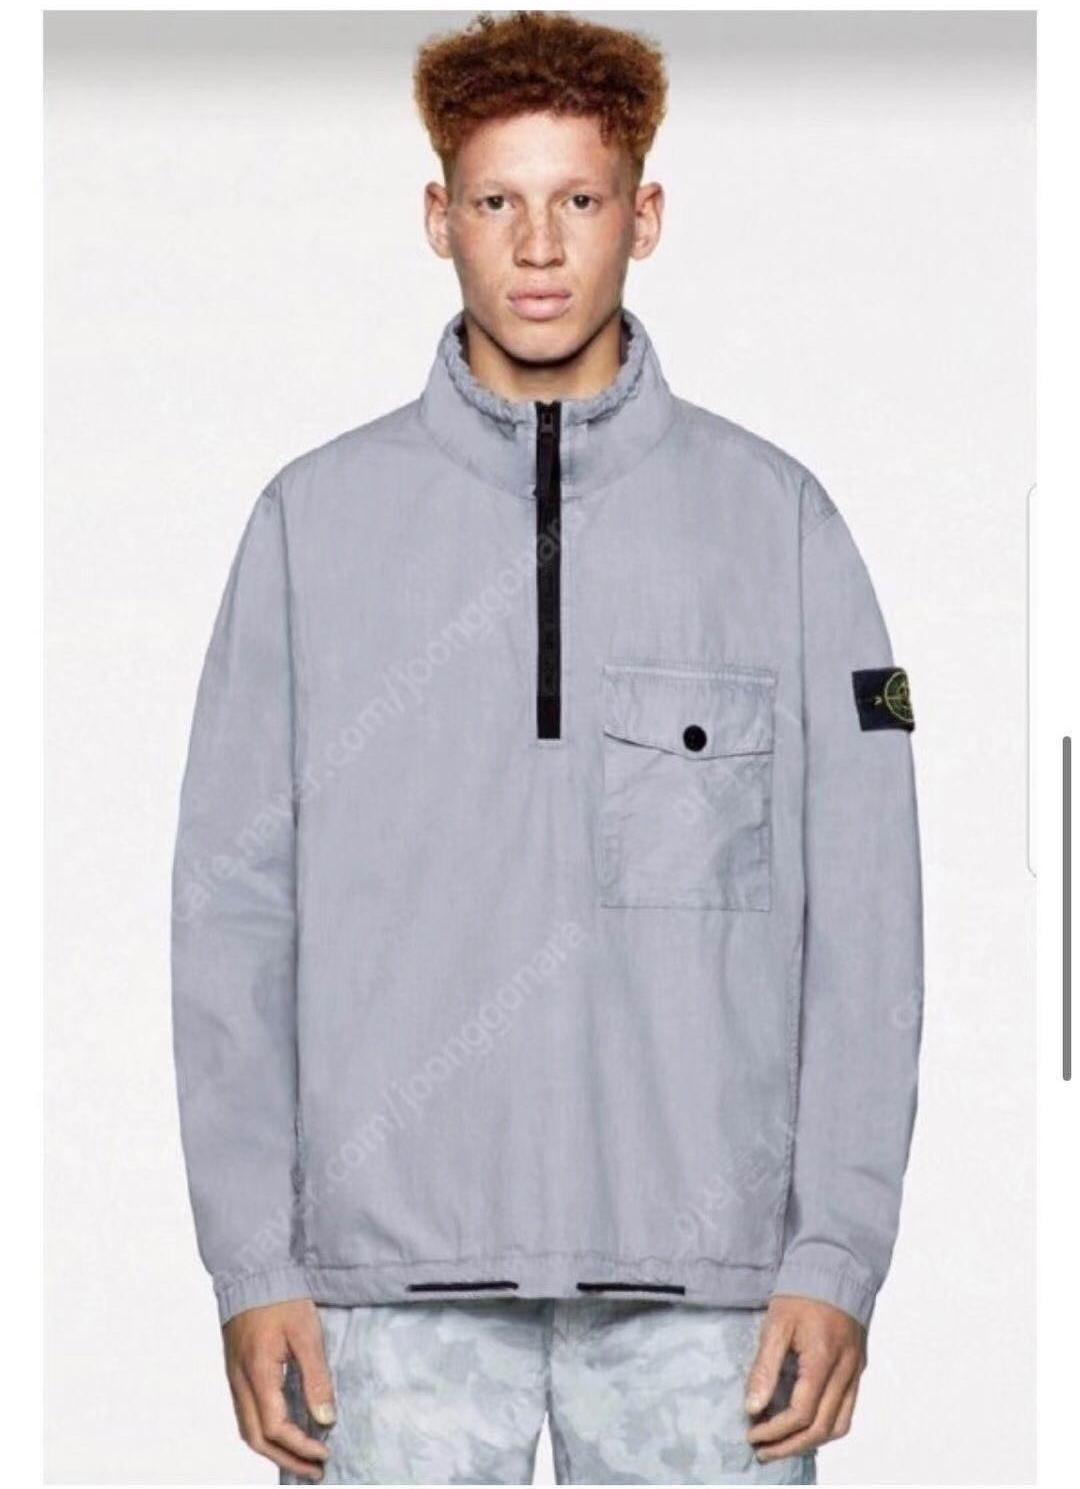 2021 Crime Stone Half-Zip Jacket Men's Jackets Compass Mark